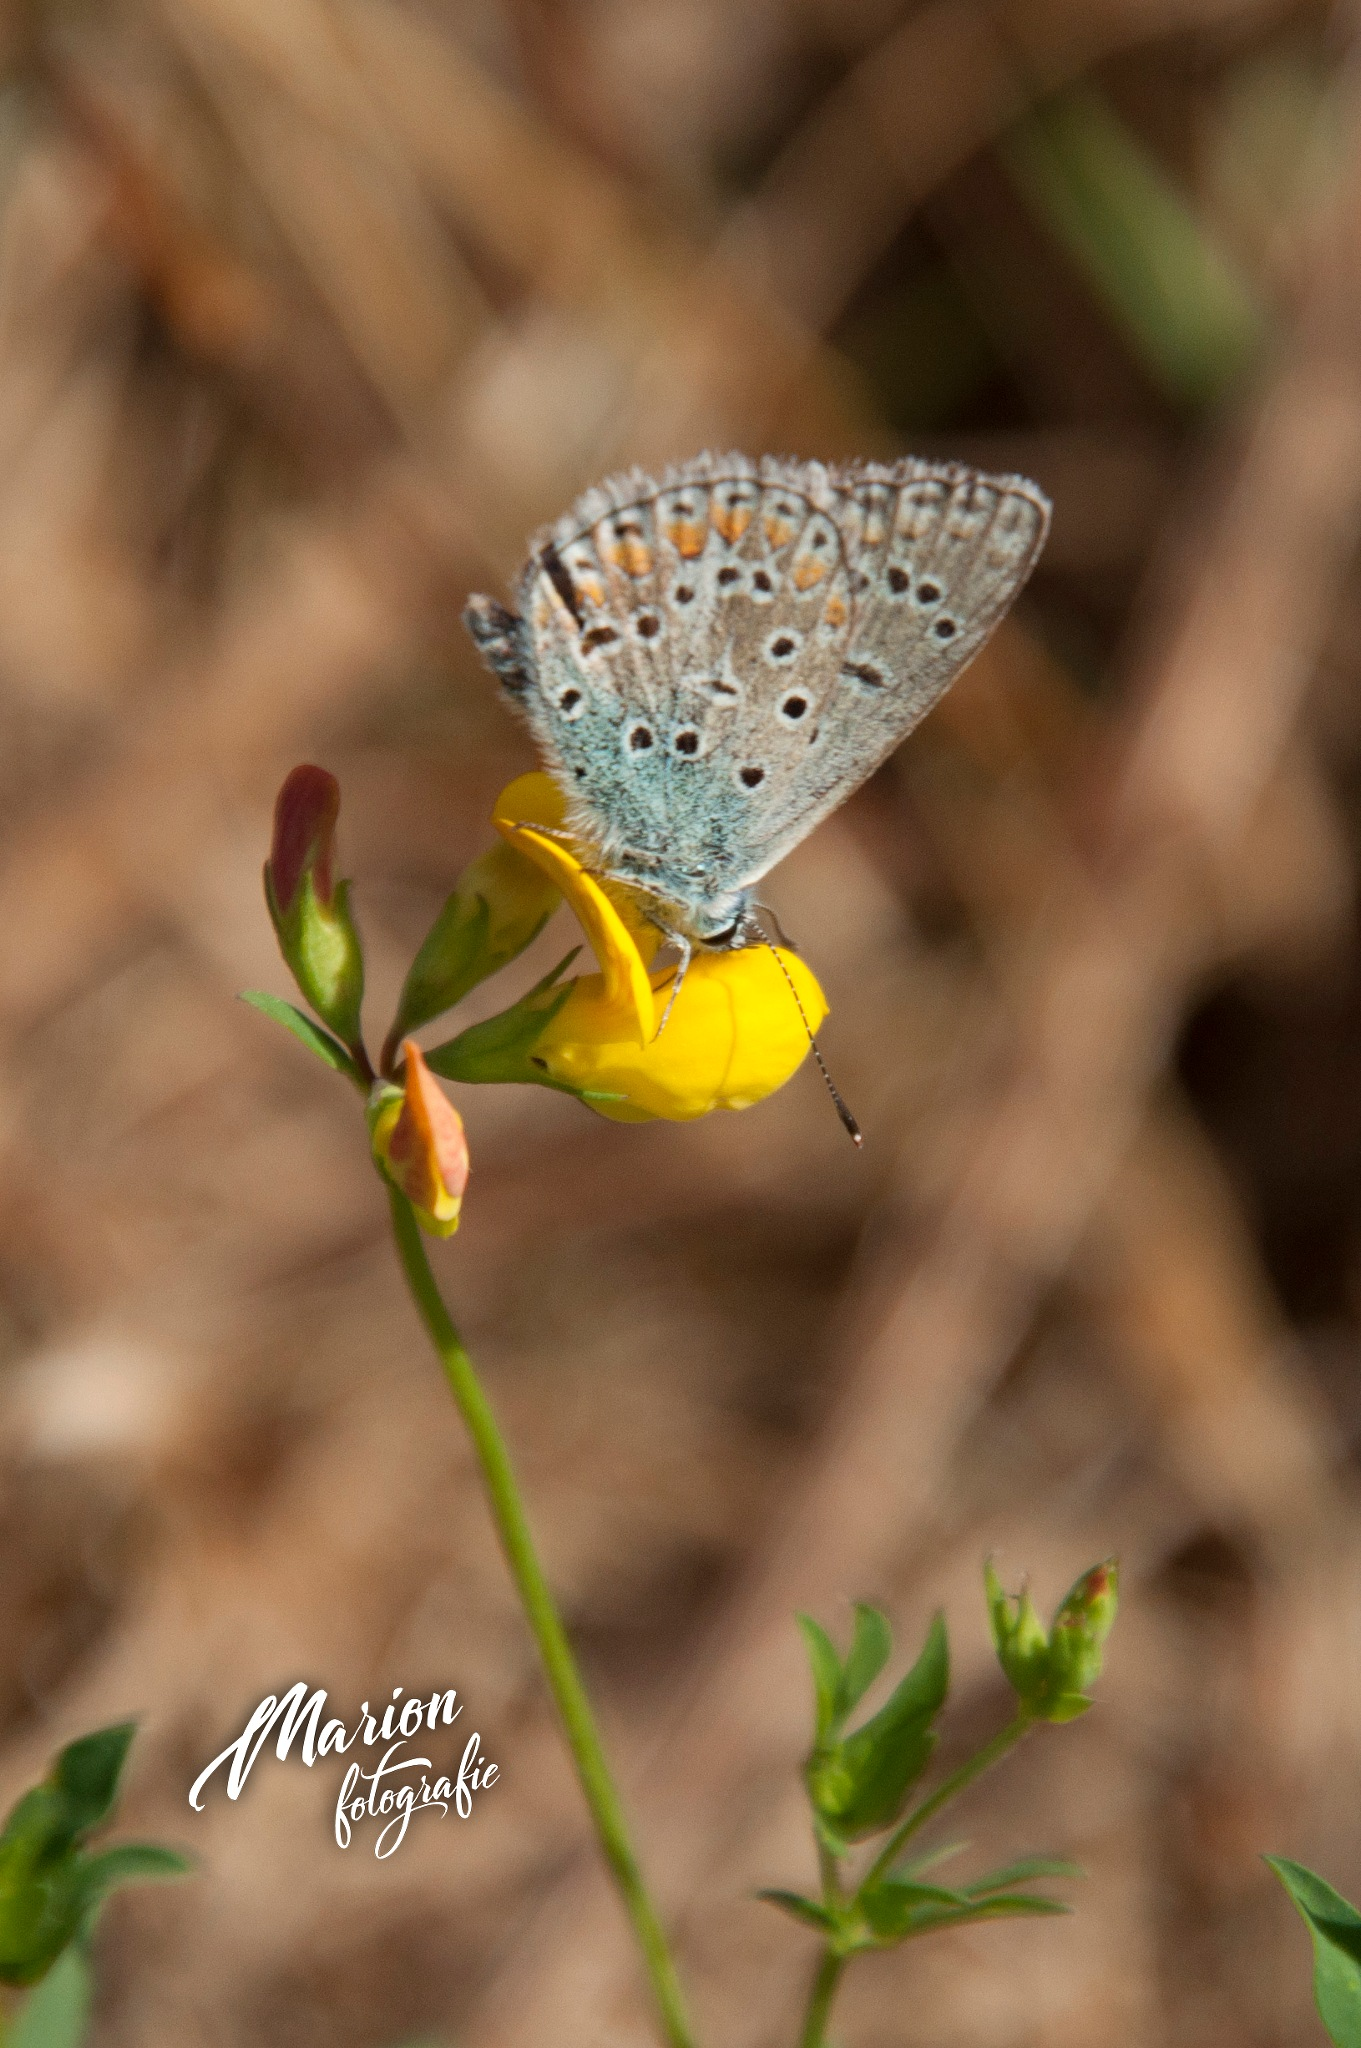 Icarusblauwtje, butterfly by Marion Verhaaf